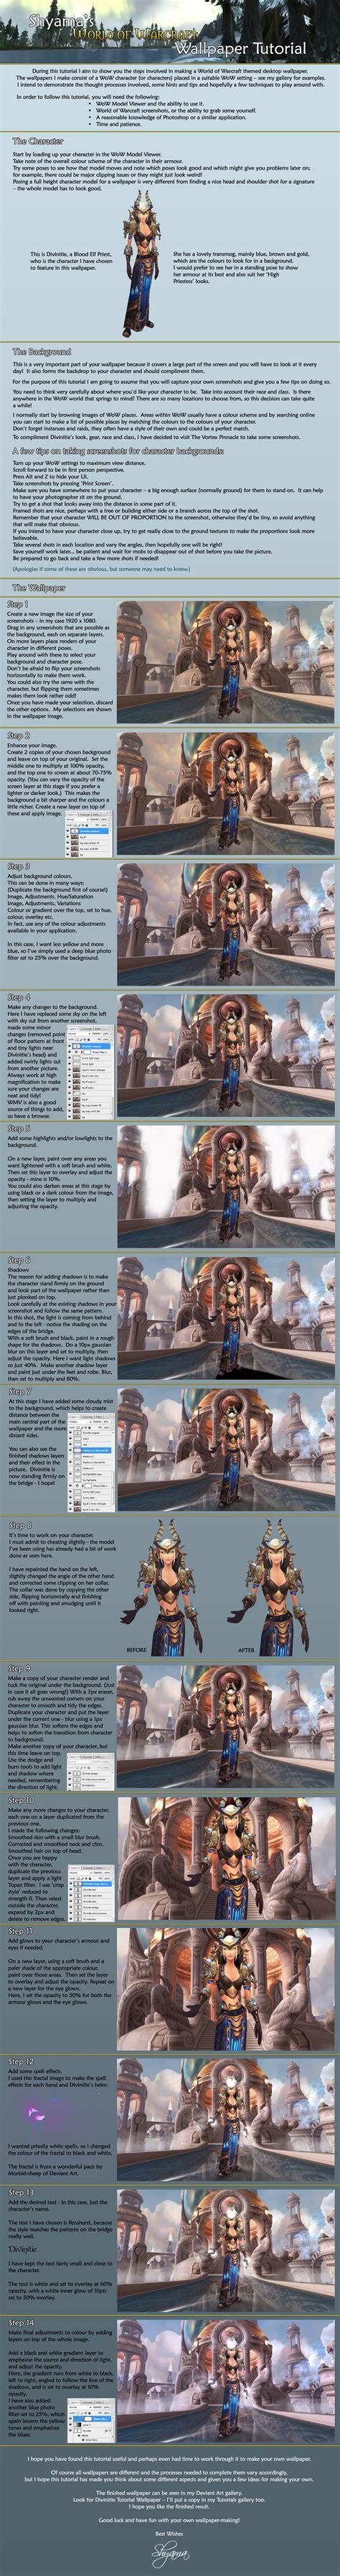 tutorial warcraft shyama s world of warcraft wallpaper tutorial by shyama88